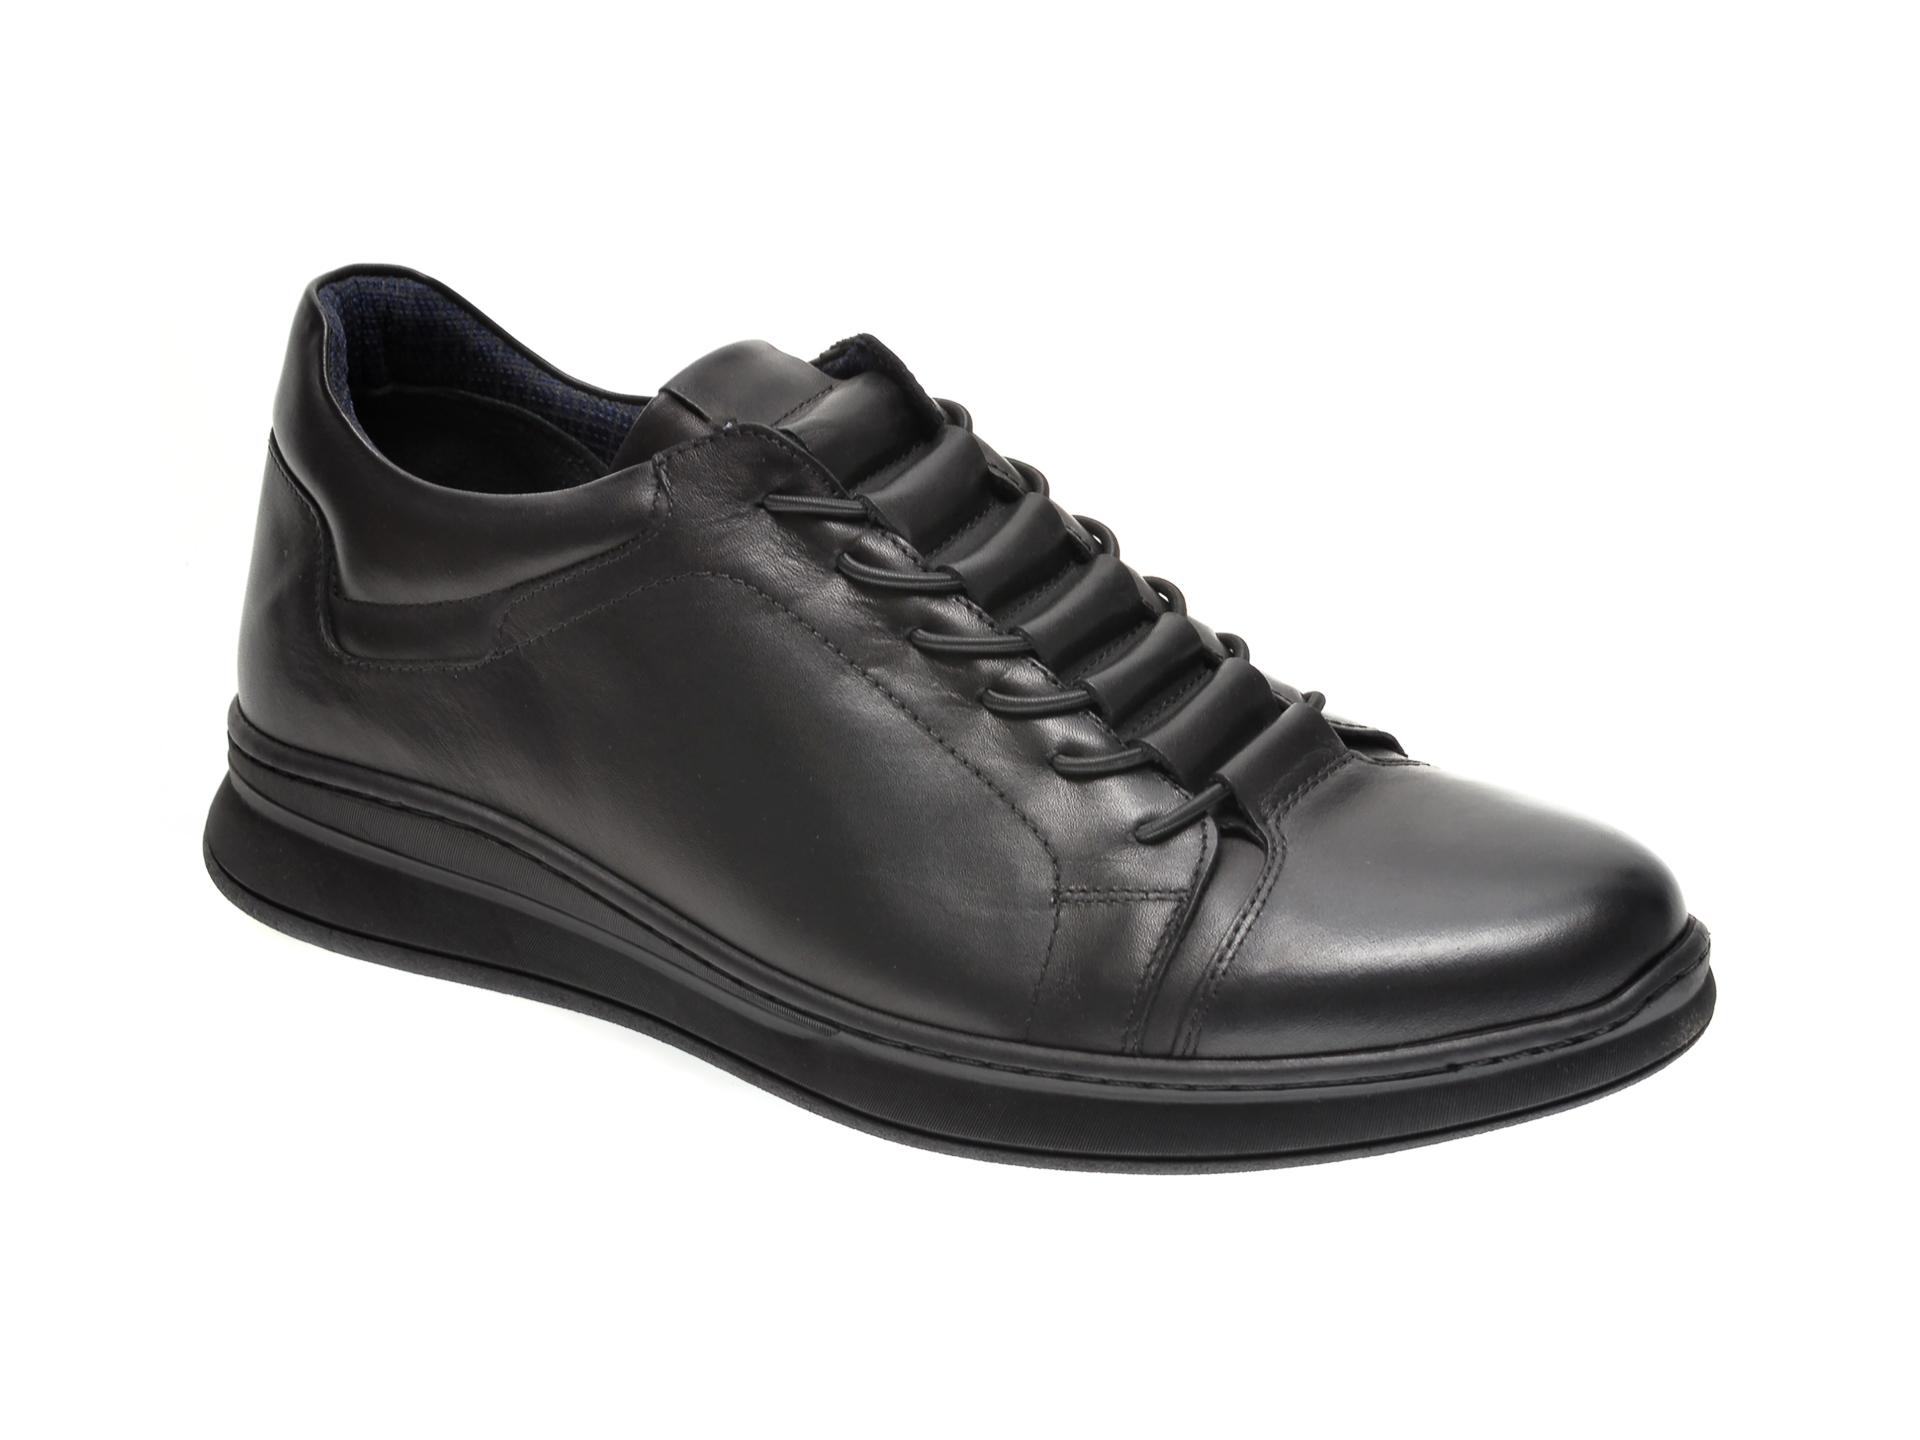 Pantofi OTTER negri, K35, din piele naturala imagine